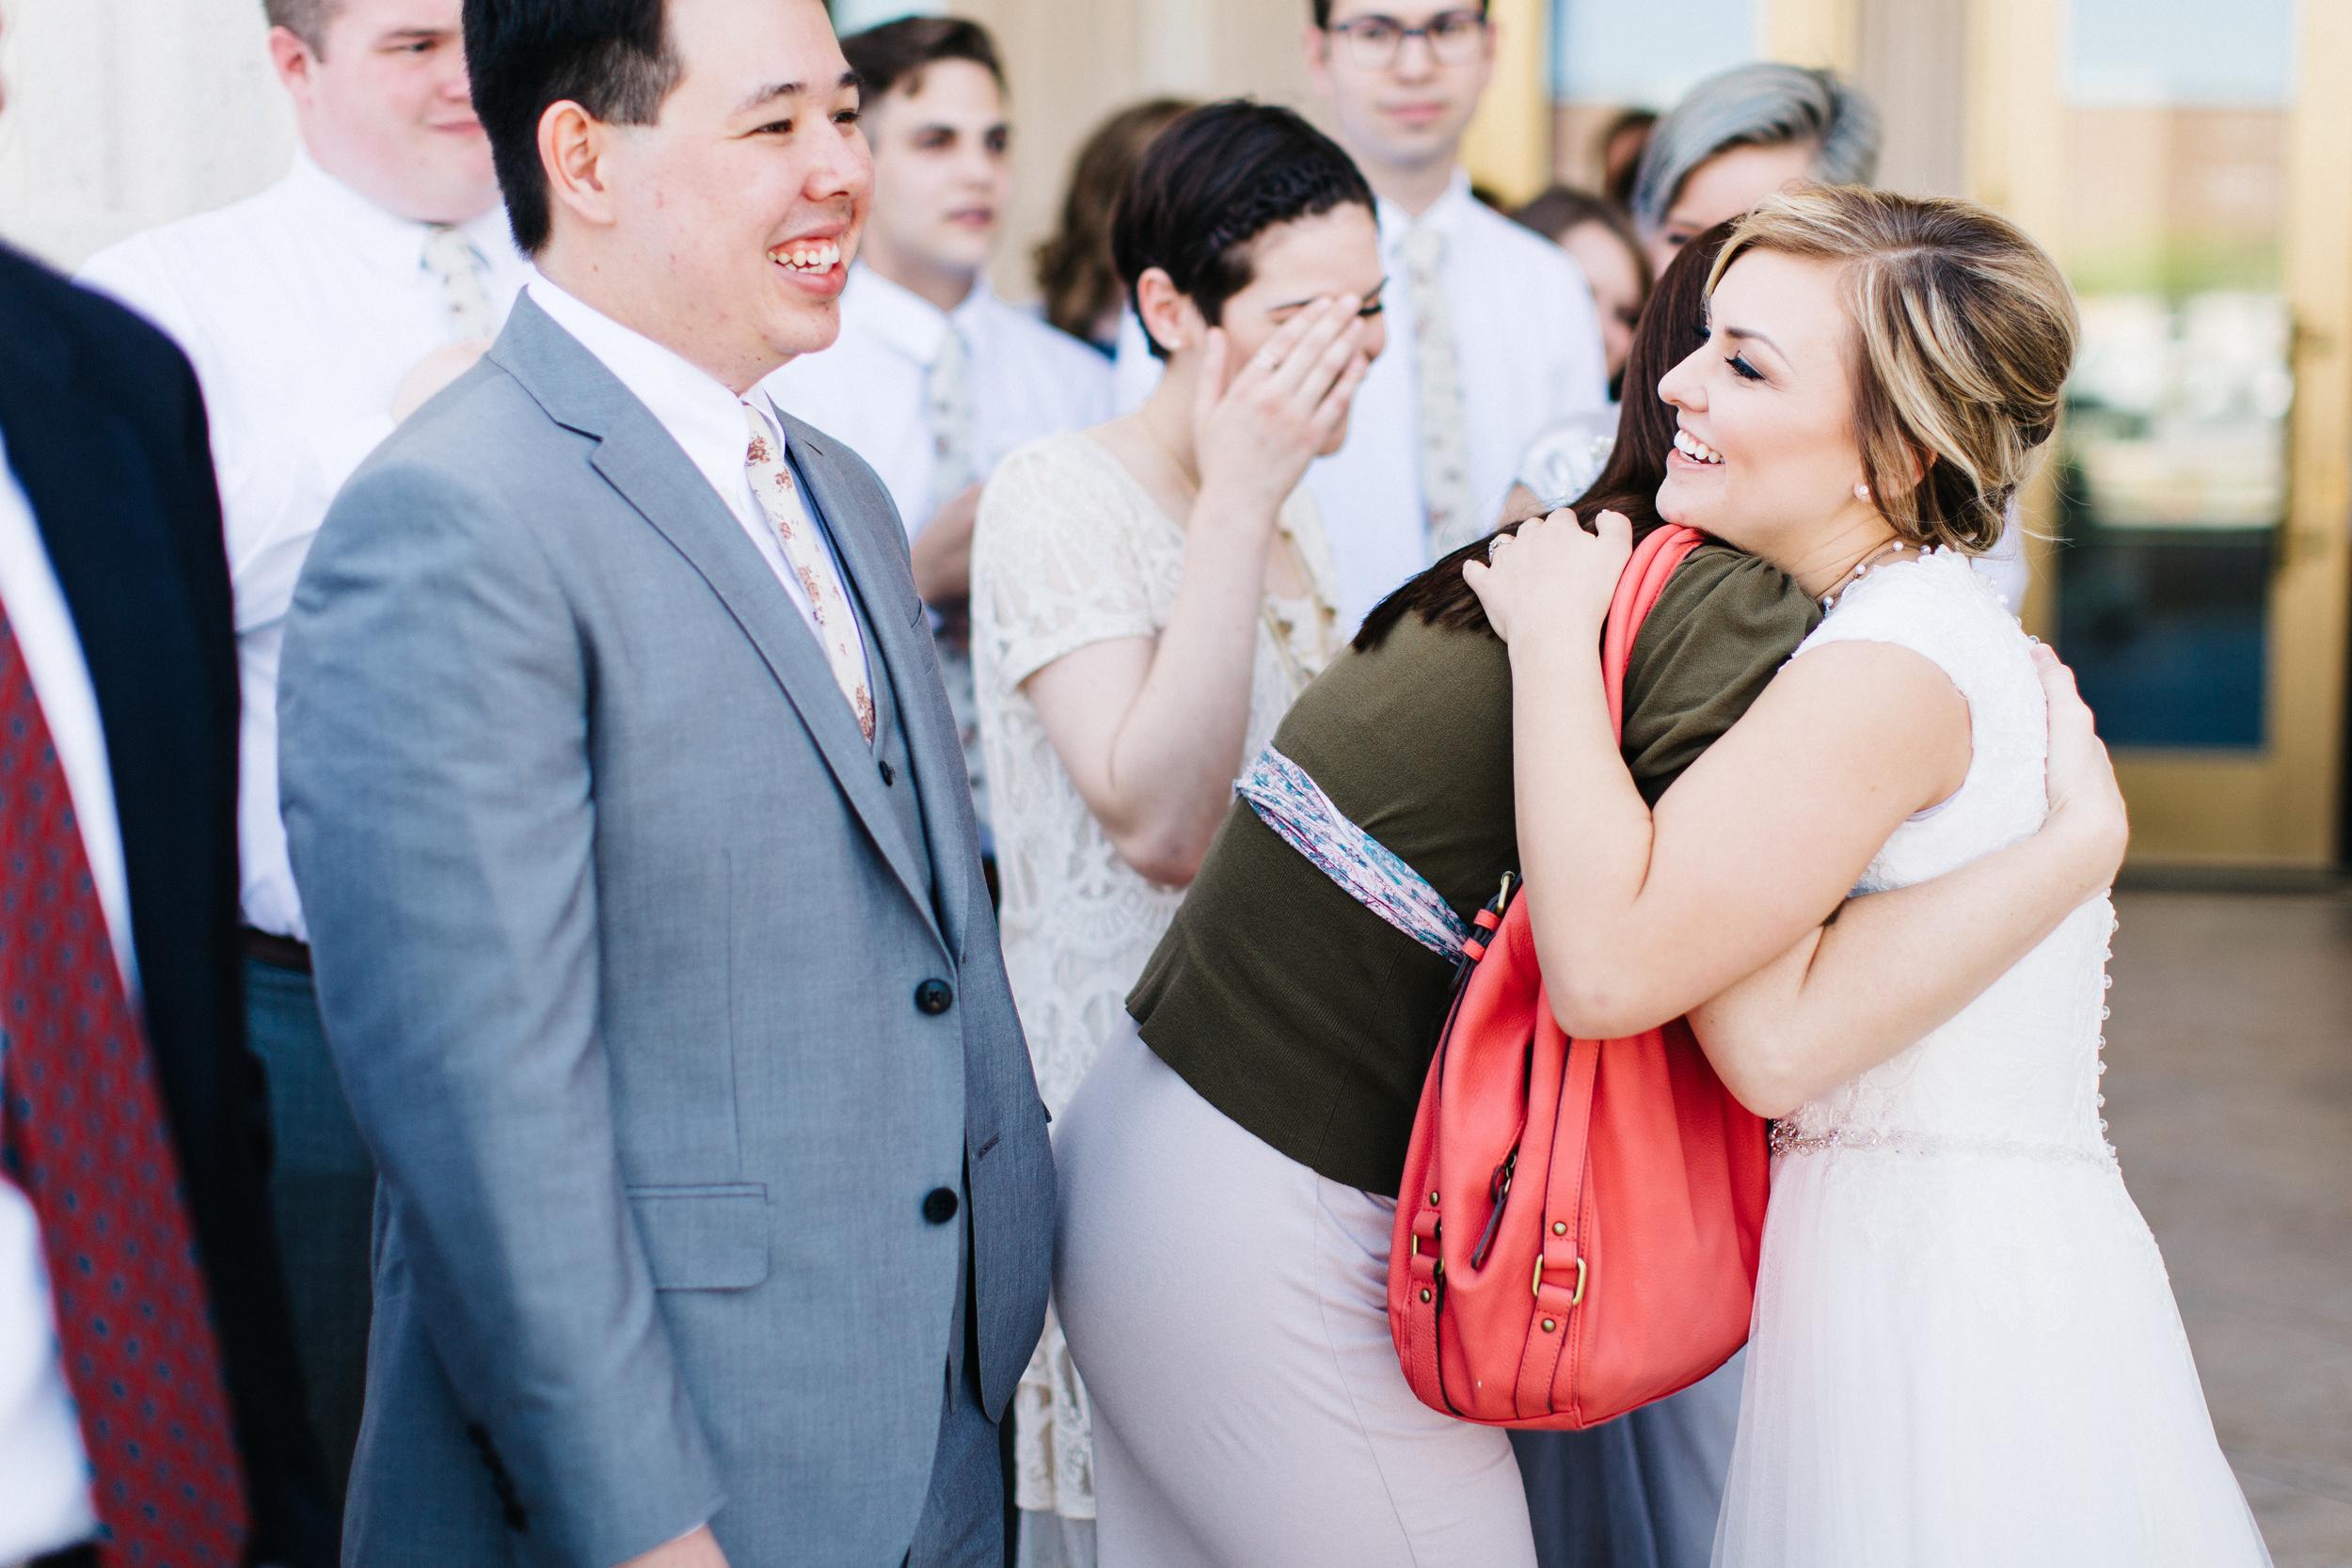 KennedyWyatt_WeddingDay-20.jpg